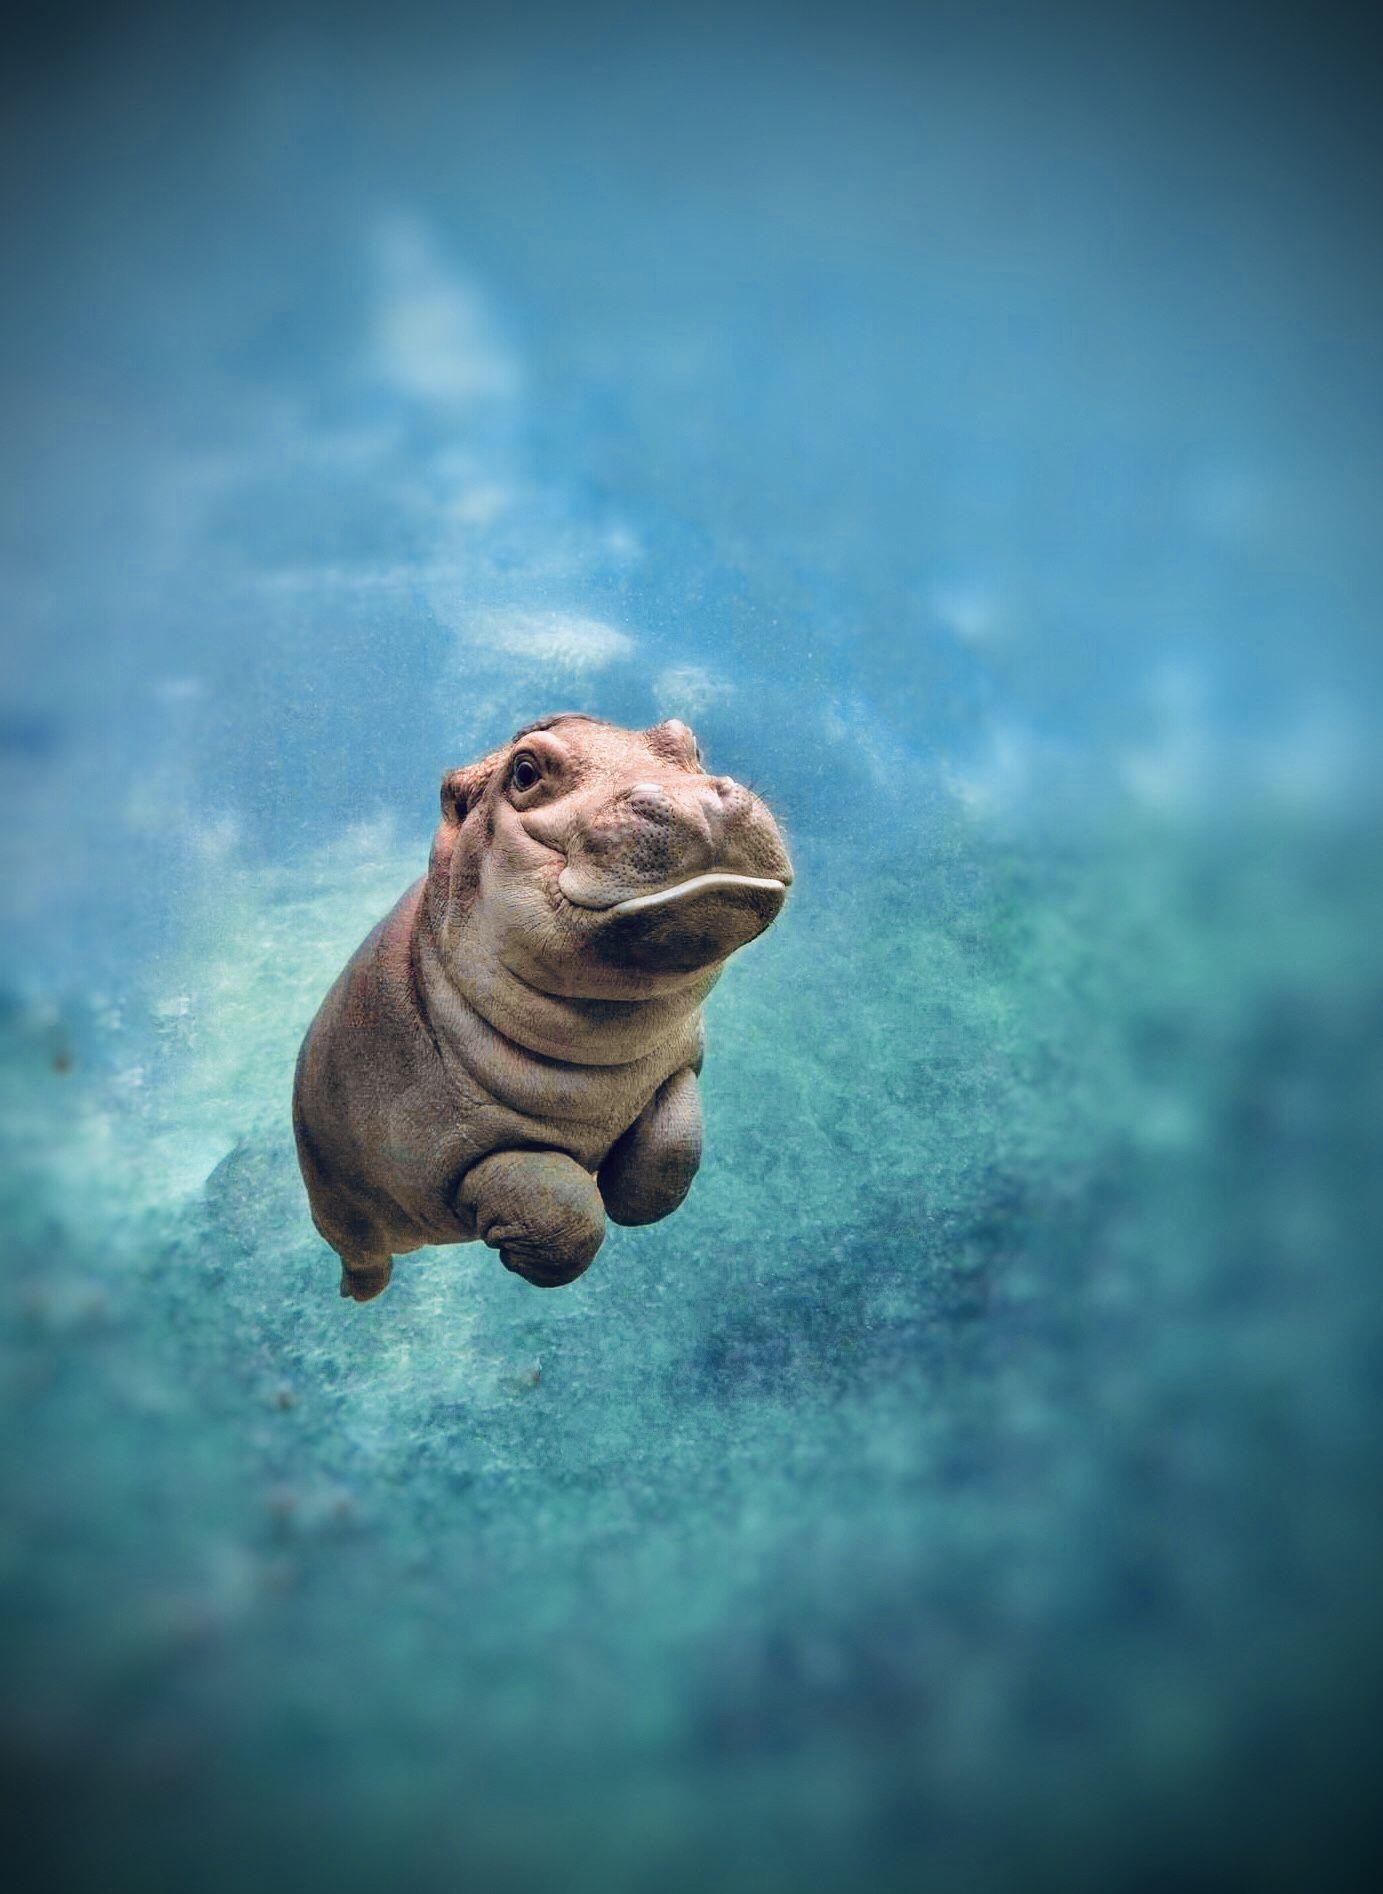 Baby Hippo Iphone Wallpaper Background Baby Hippo Hippopotamus Hippo